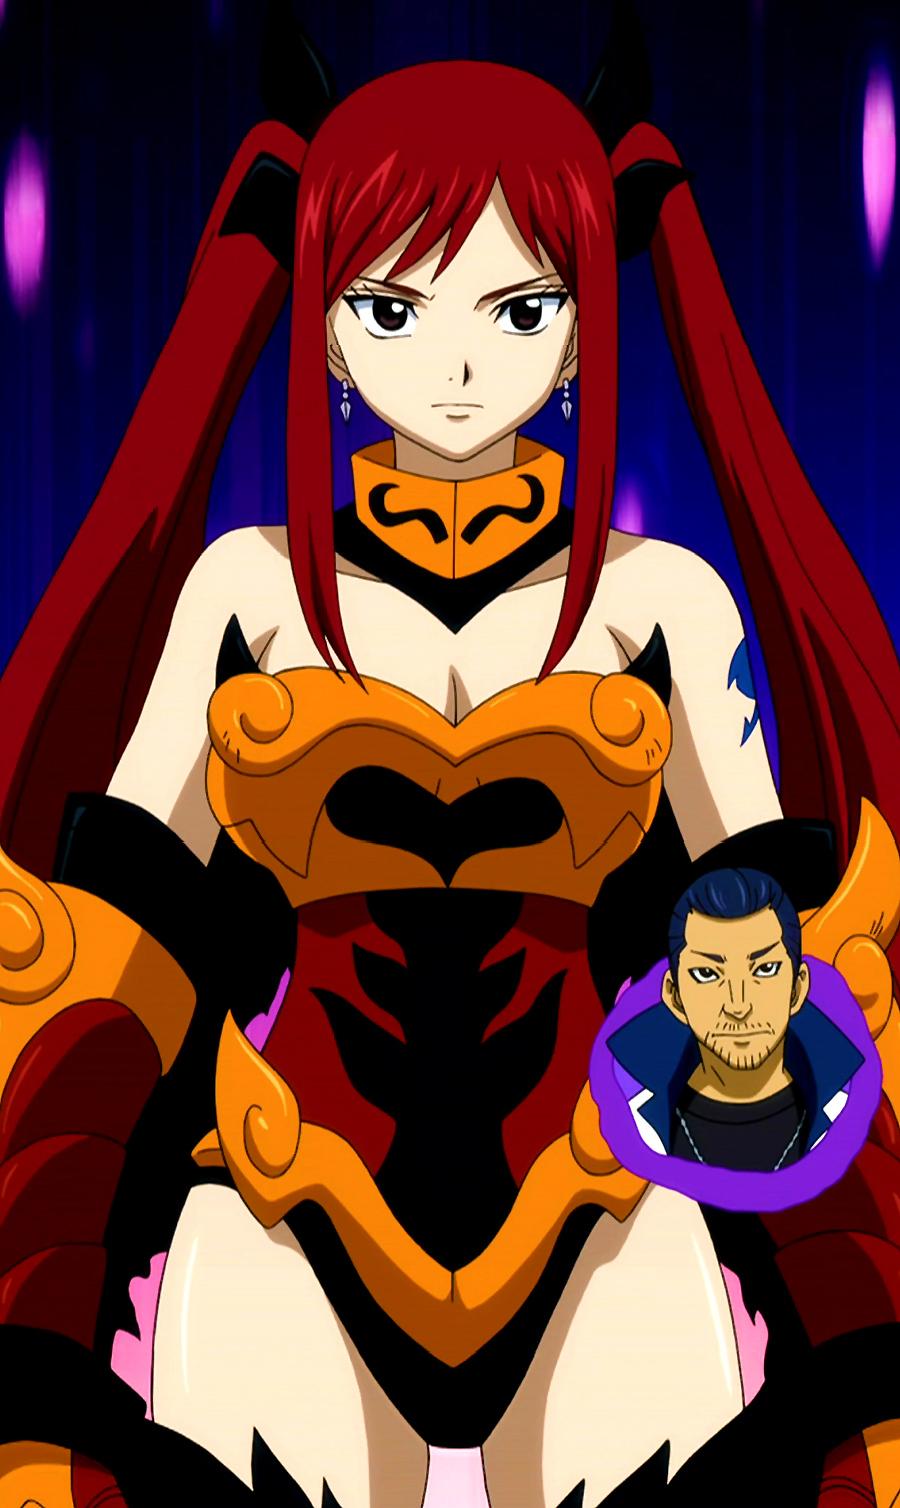 Flame Empress Armor - CloseFairy Tail Erza Flame Empress Armor